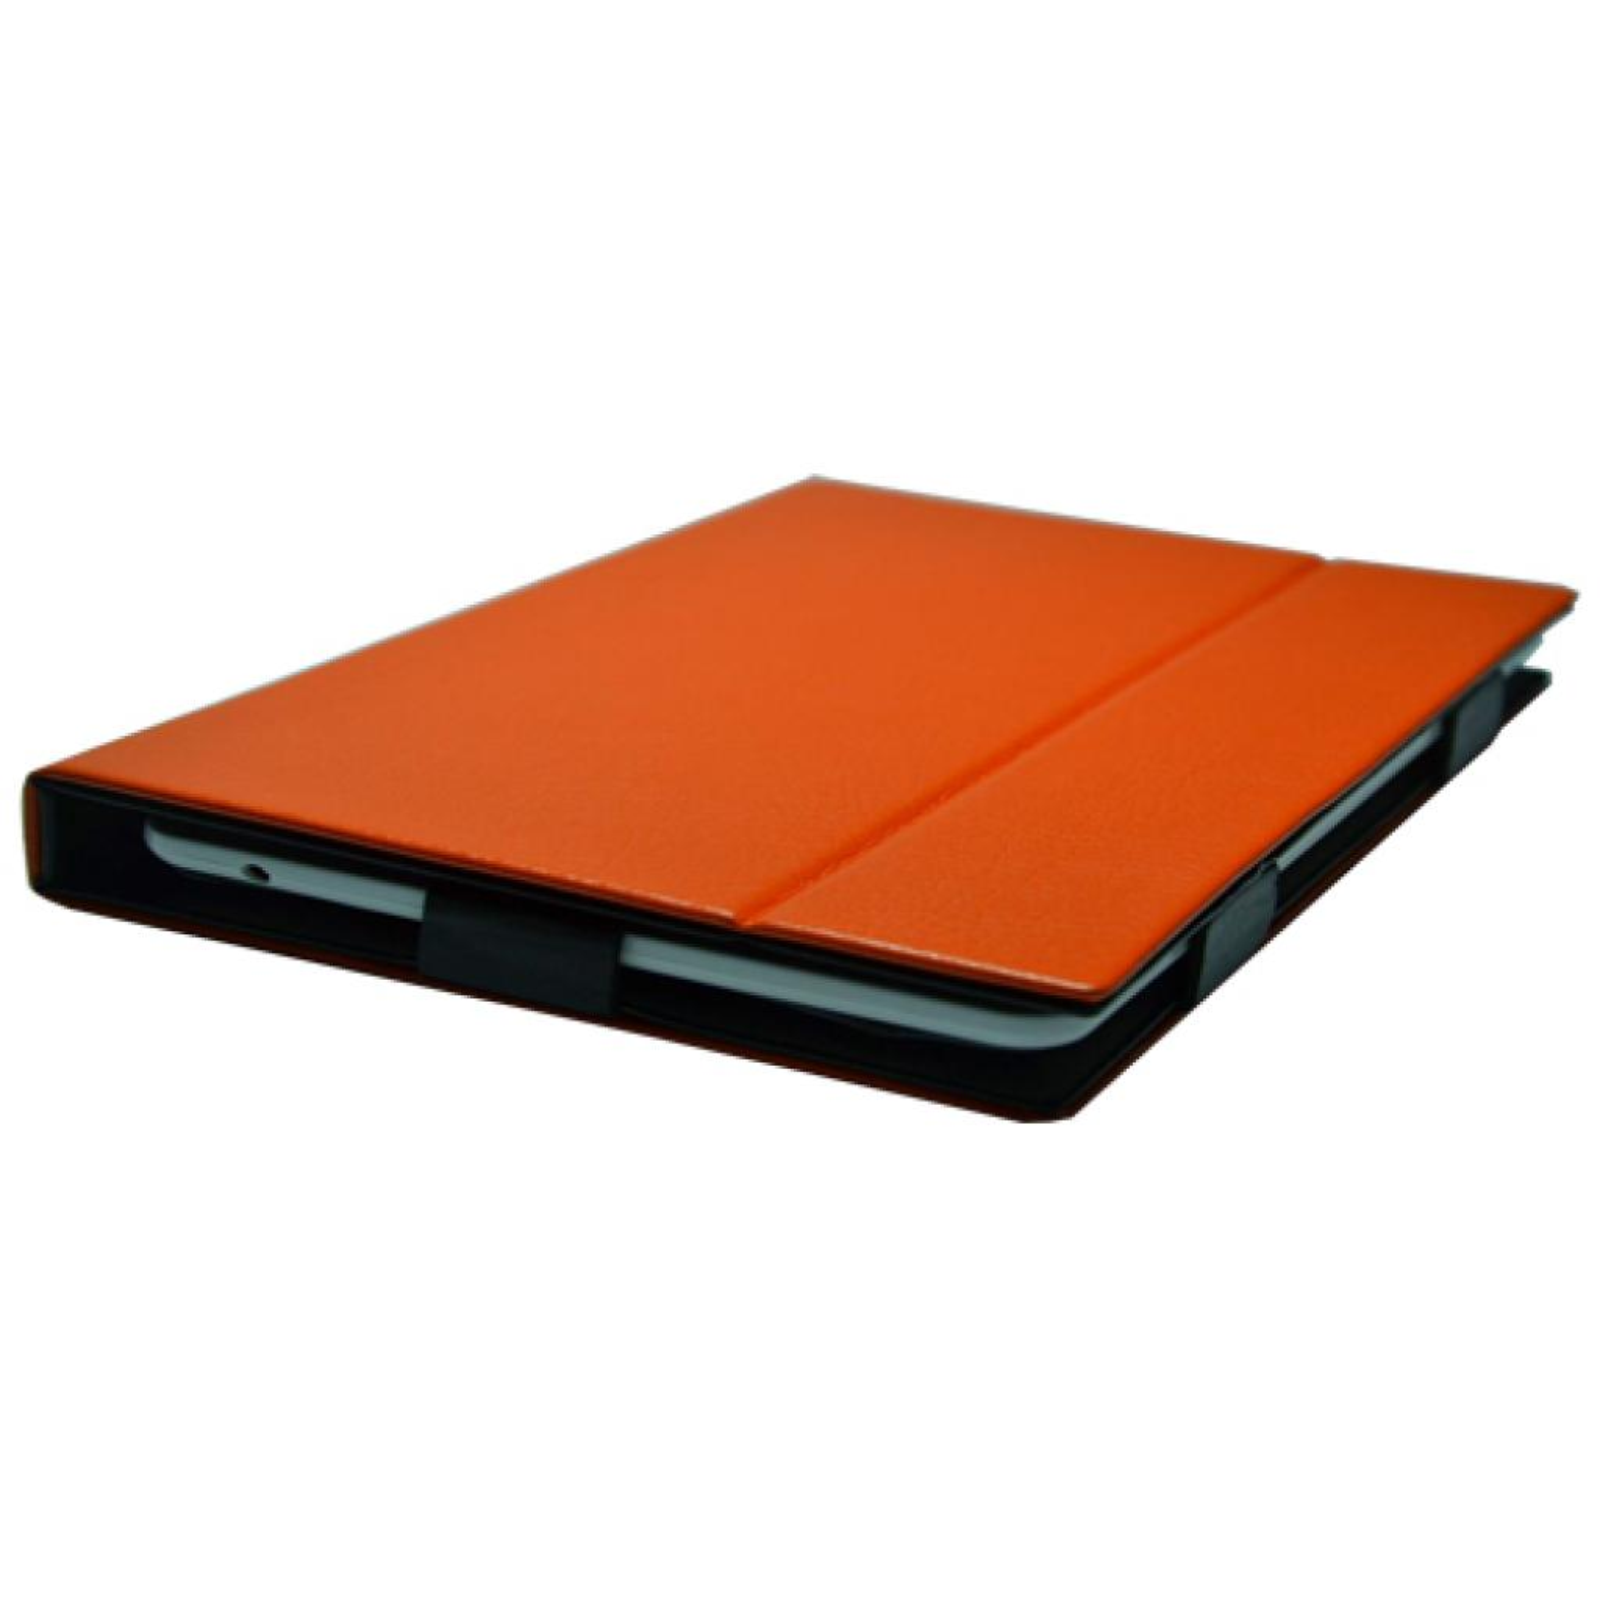 Чехол для планшета Vento 9 Desire Bright - orange изображение 3